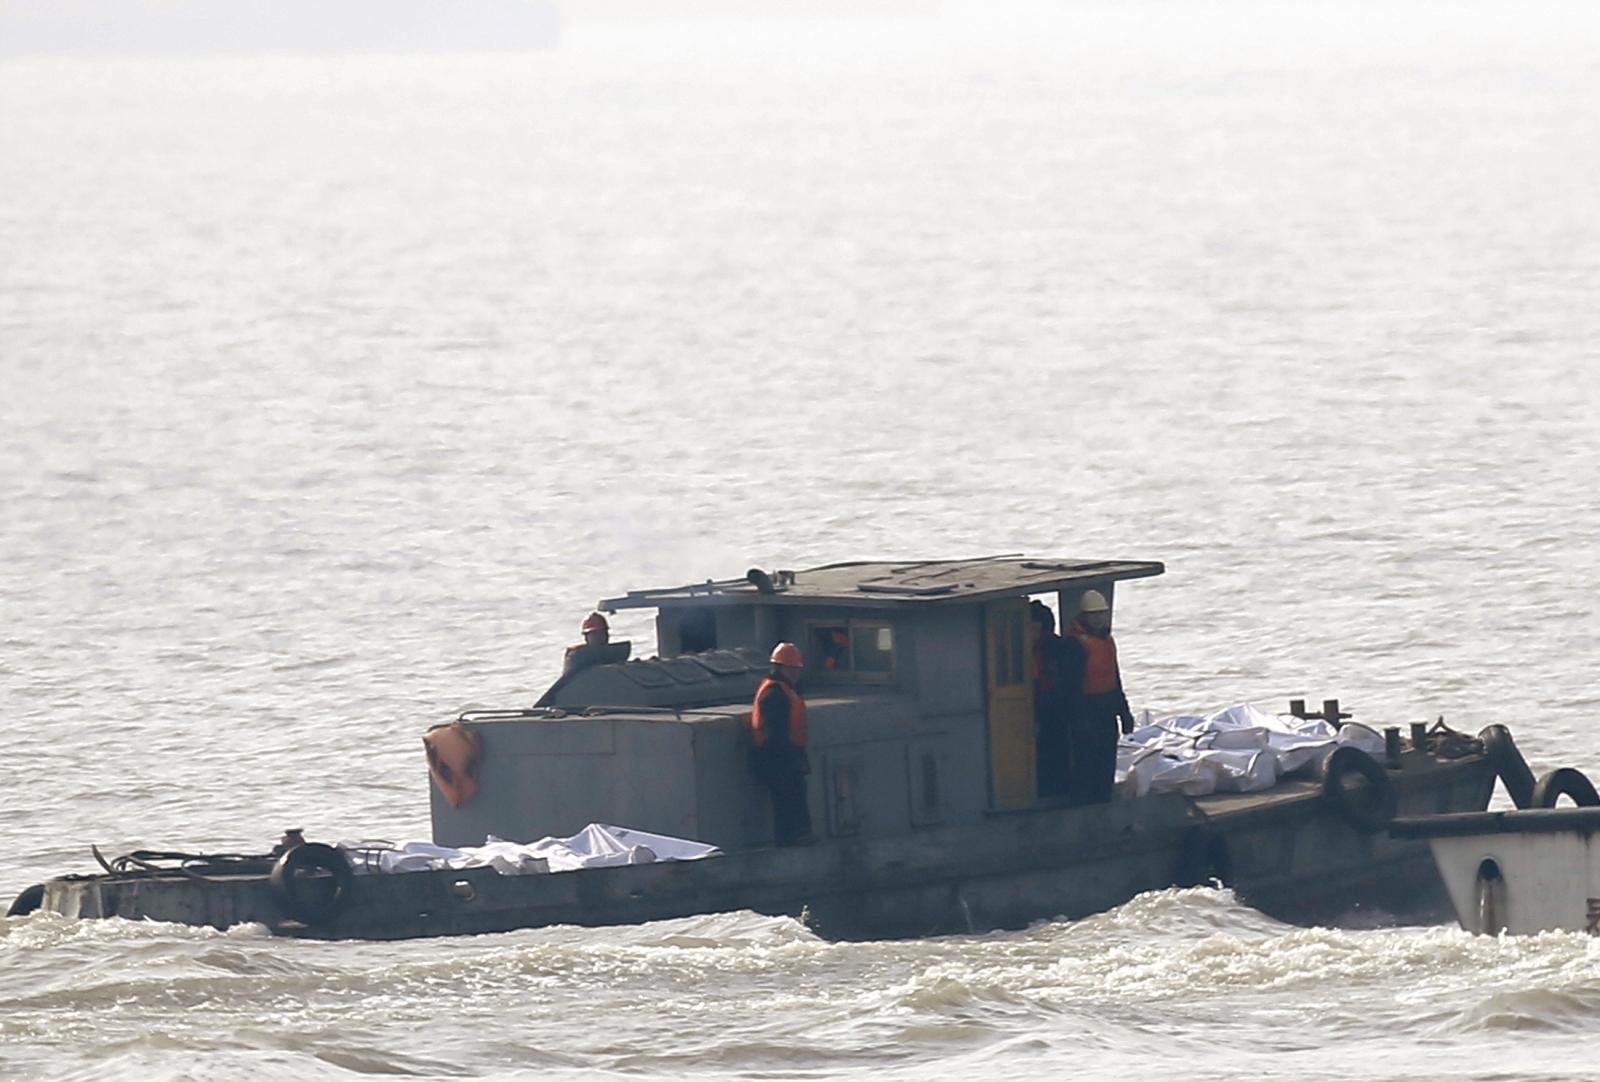 China Yangtze boat capsize tragedy